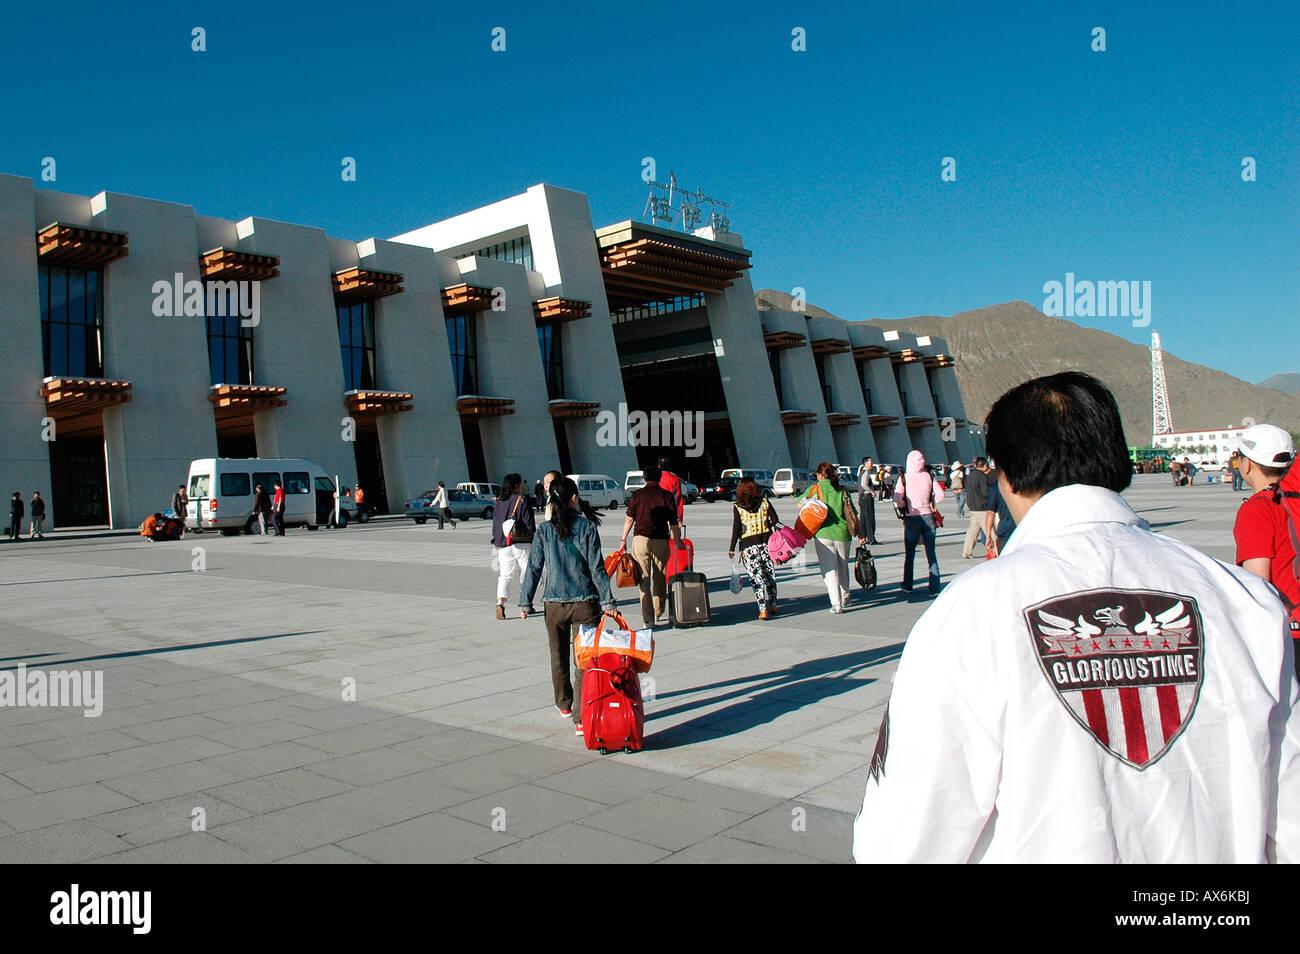 Lhasa train station, Tibet - Stock Image